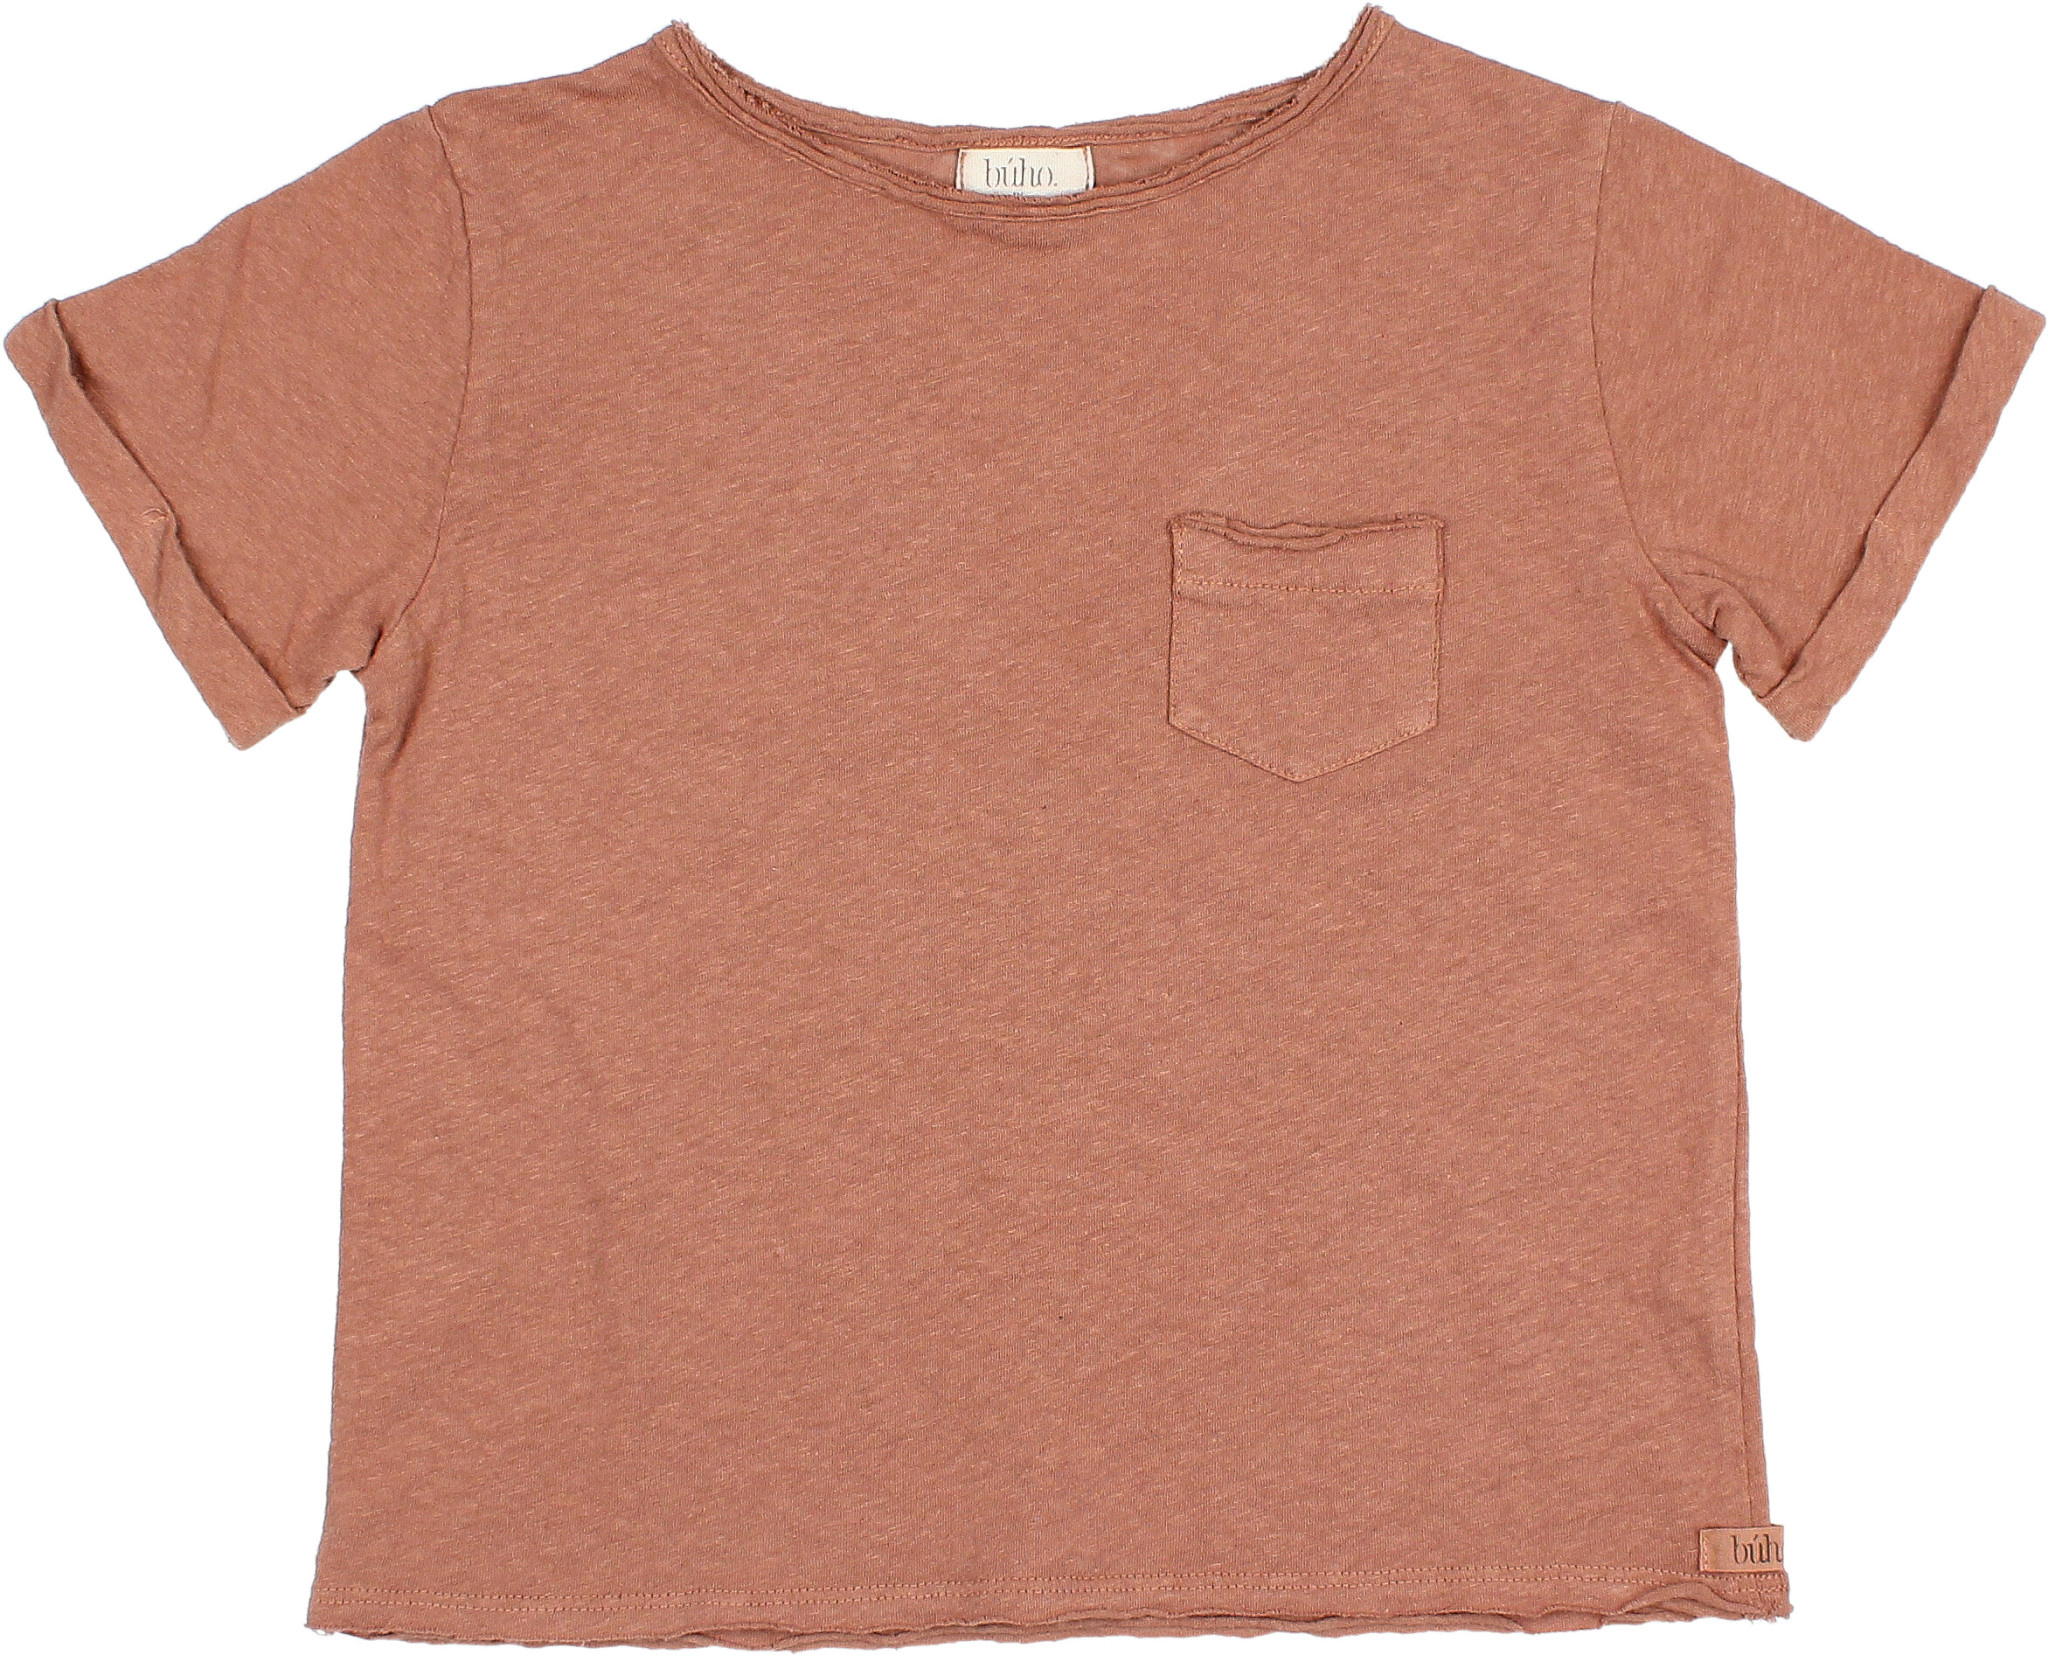 James t-shirt cocoa-6